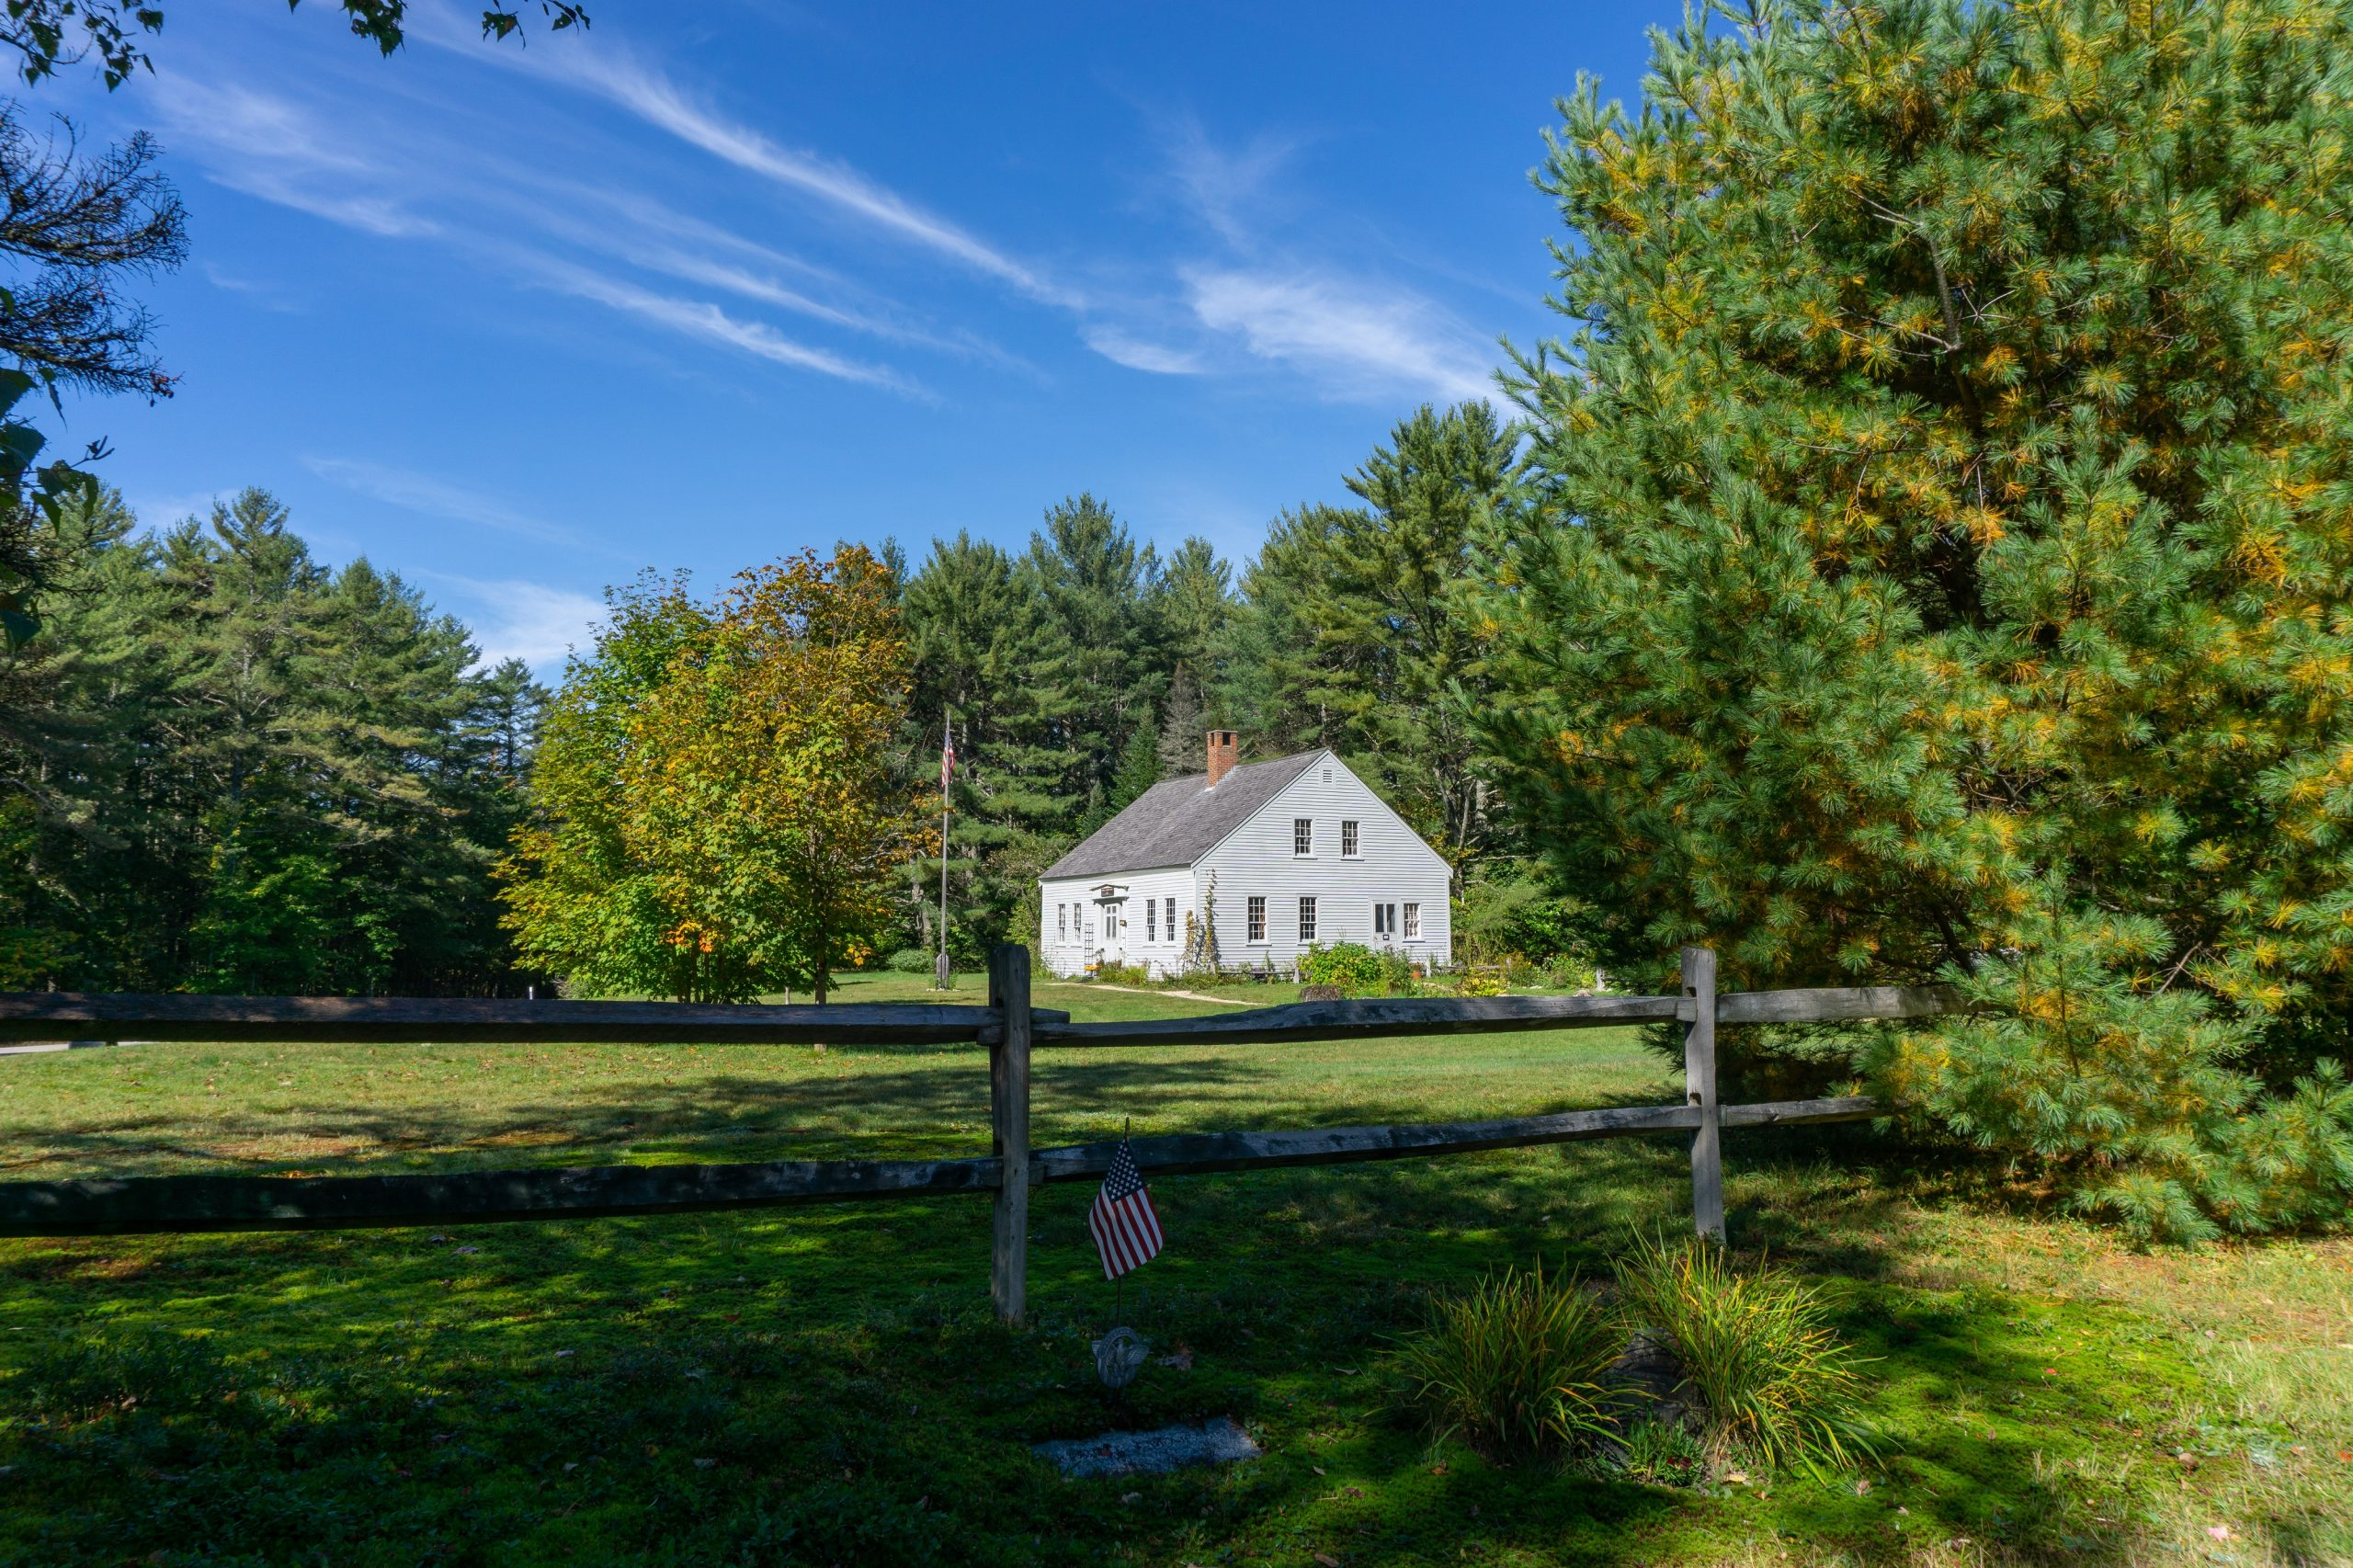 Passaconaway Russell-Colbath Homestead from Passaconaway Cemetery